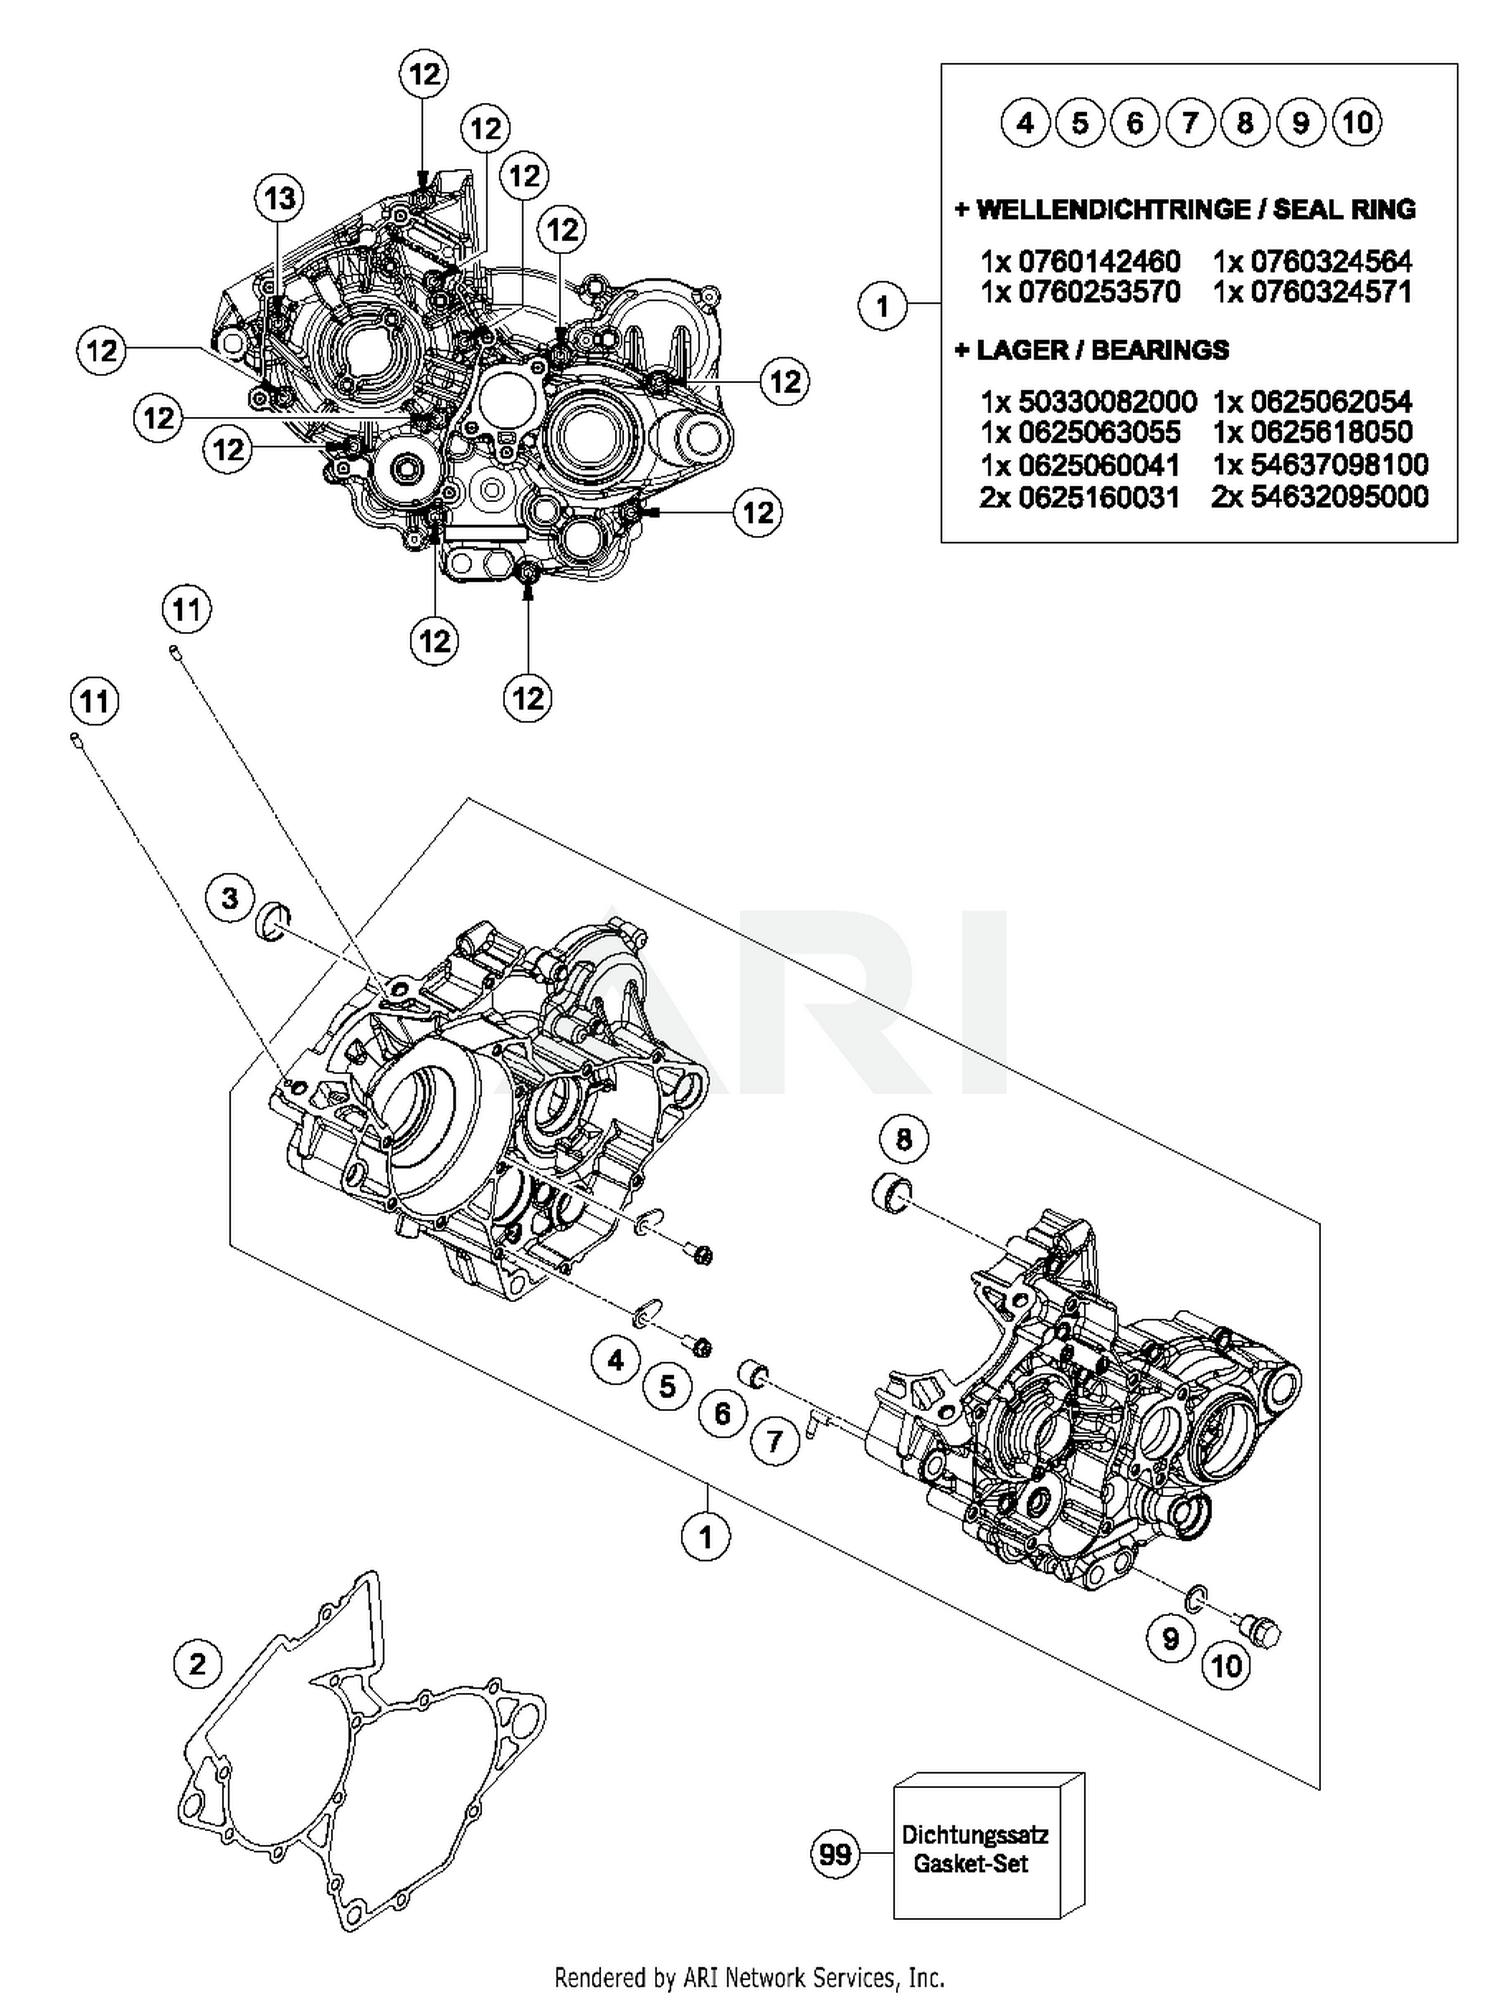 generalwiringdiagram: Ktm 250 Engine Diagram